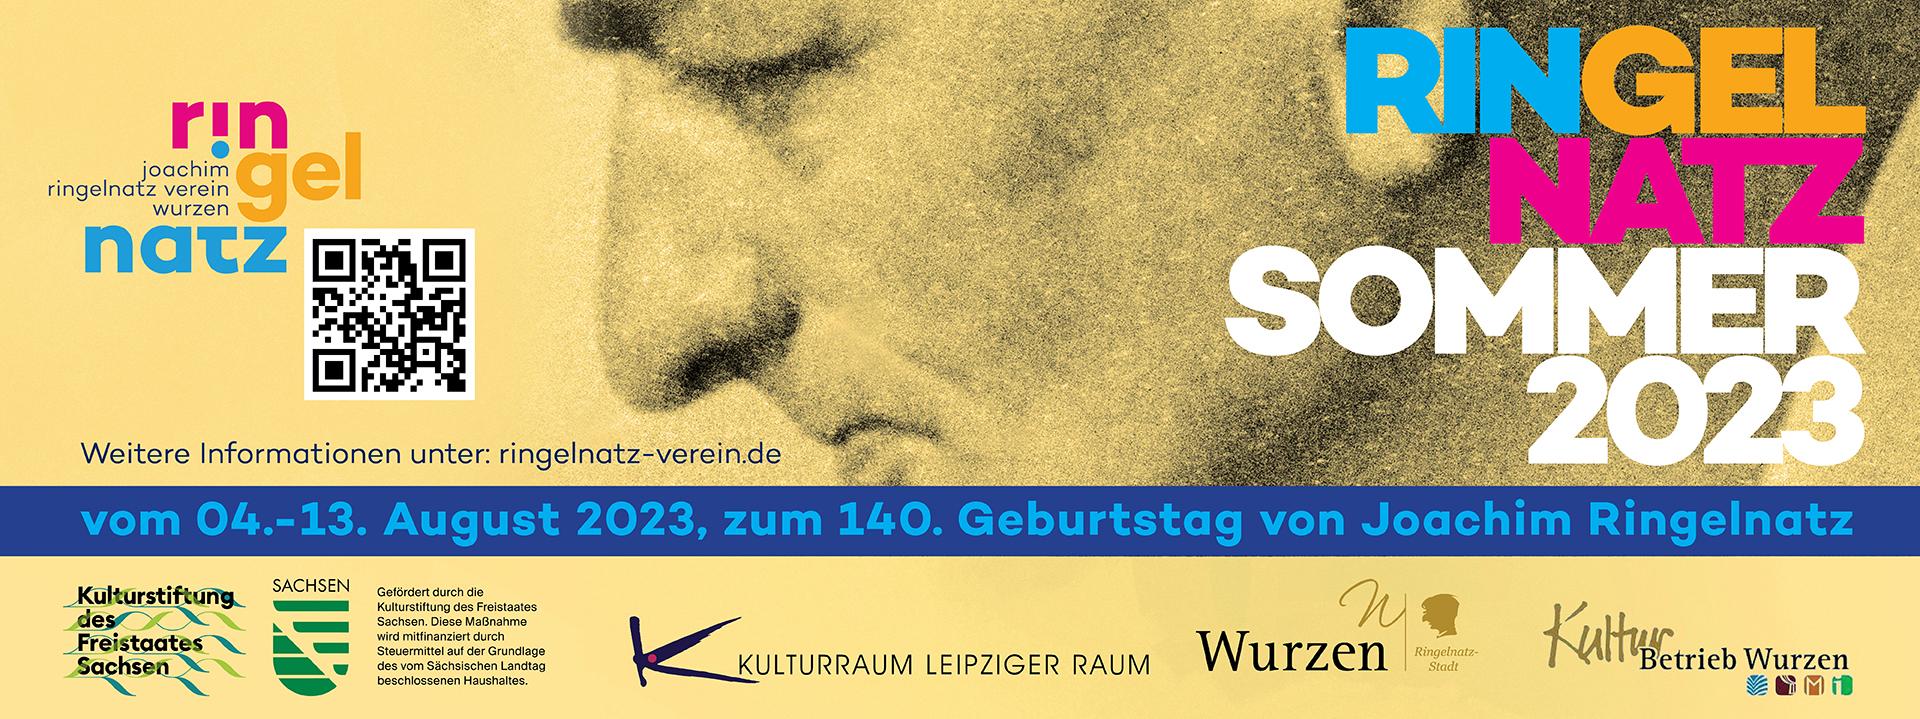 KulturBetrieb Wurzen Startseite Banner 5 (Click & Collect)